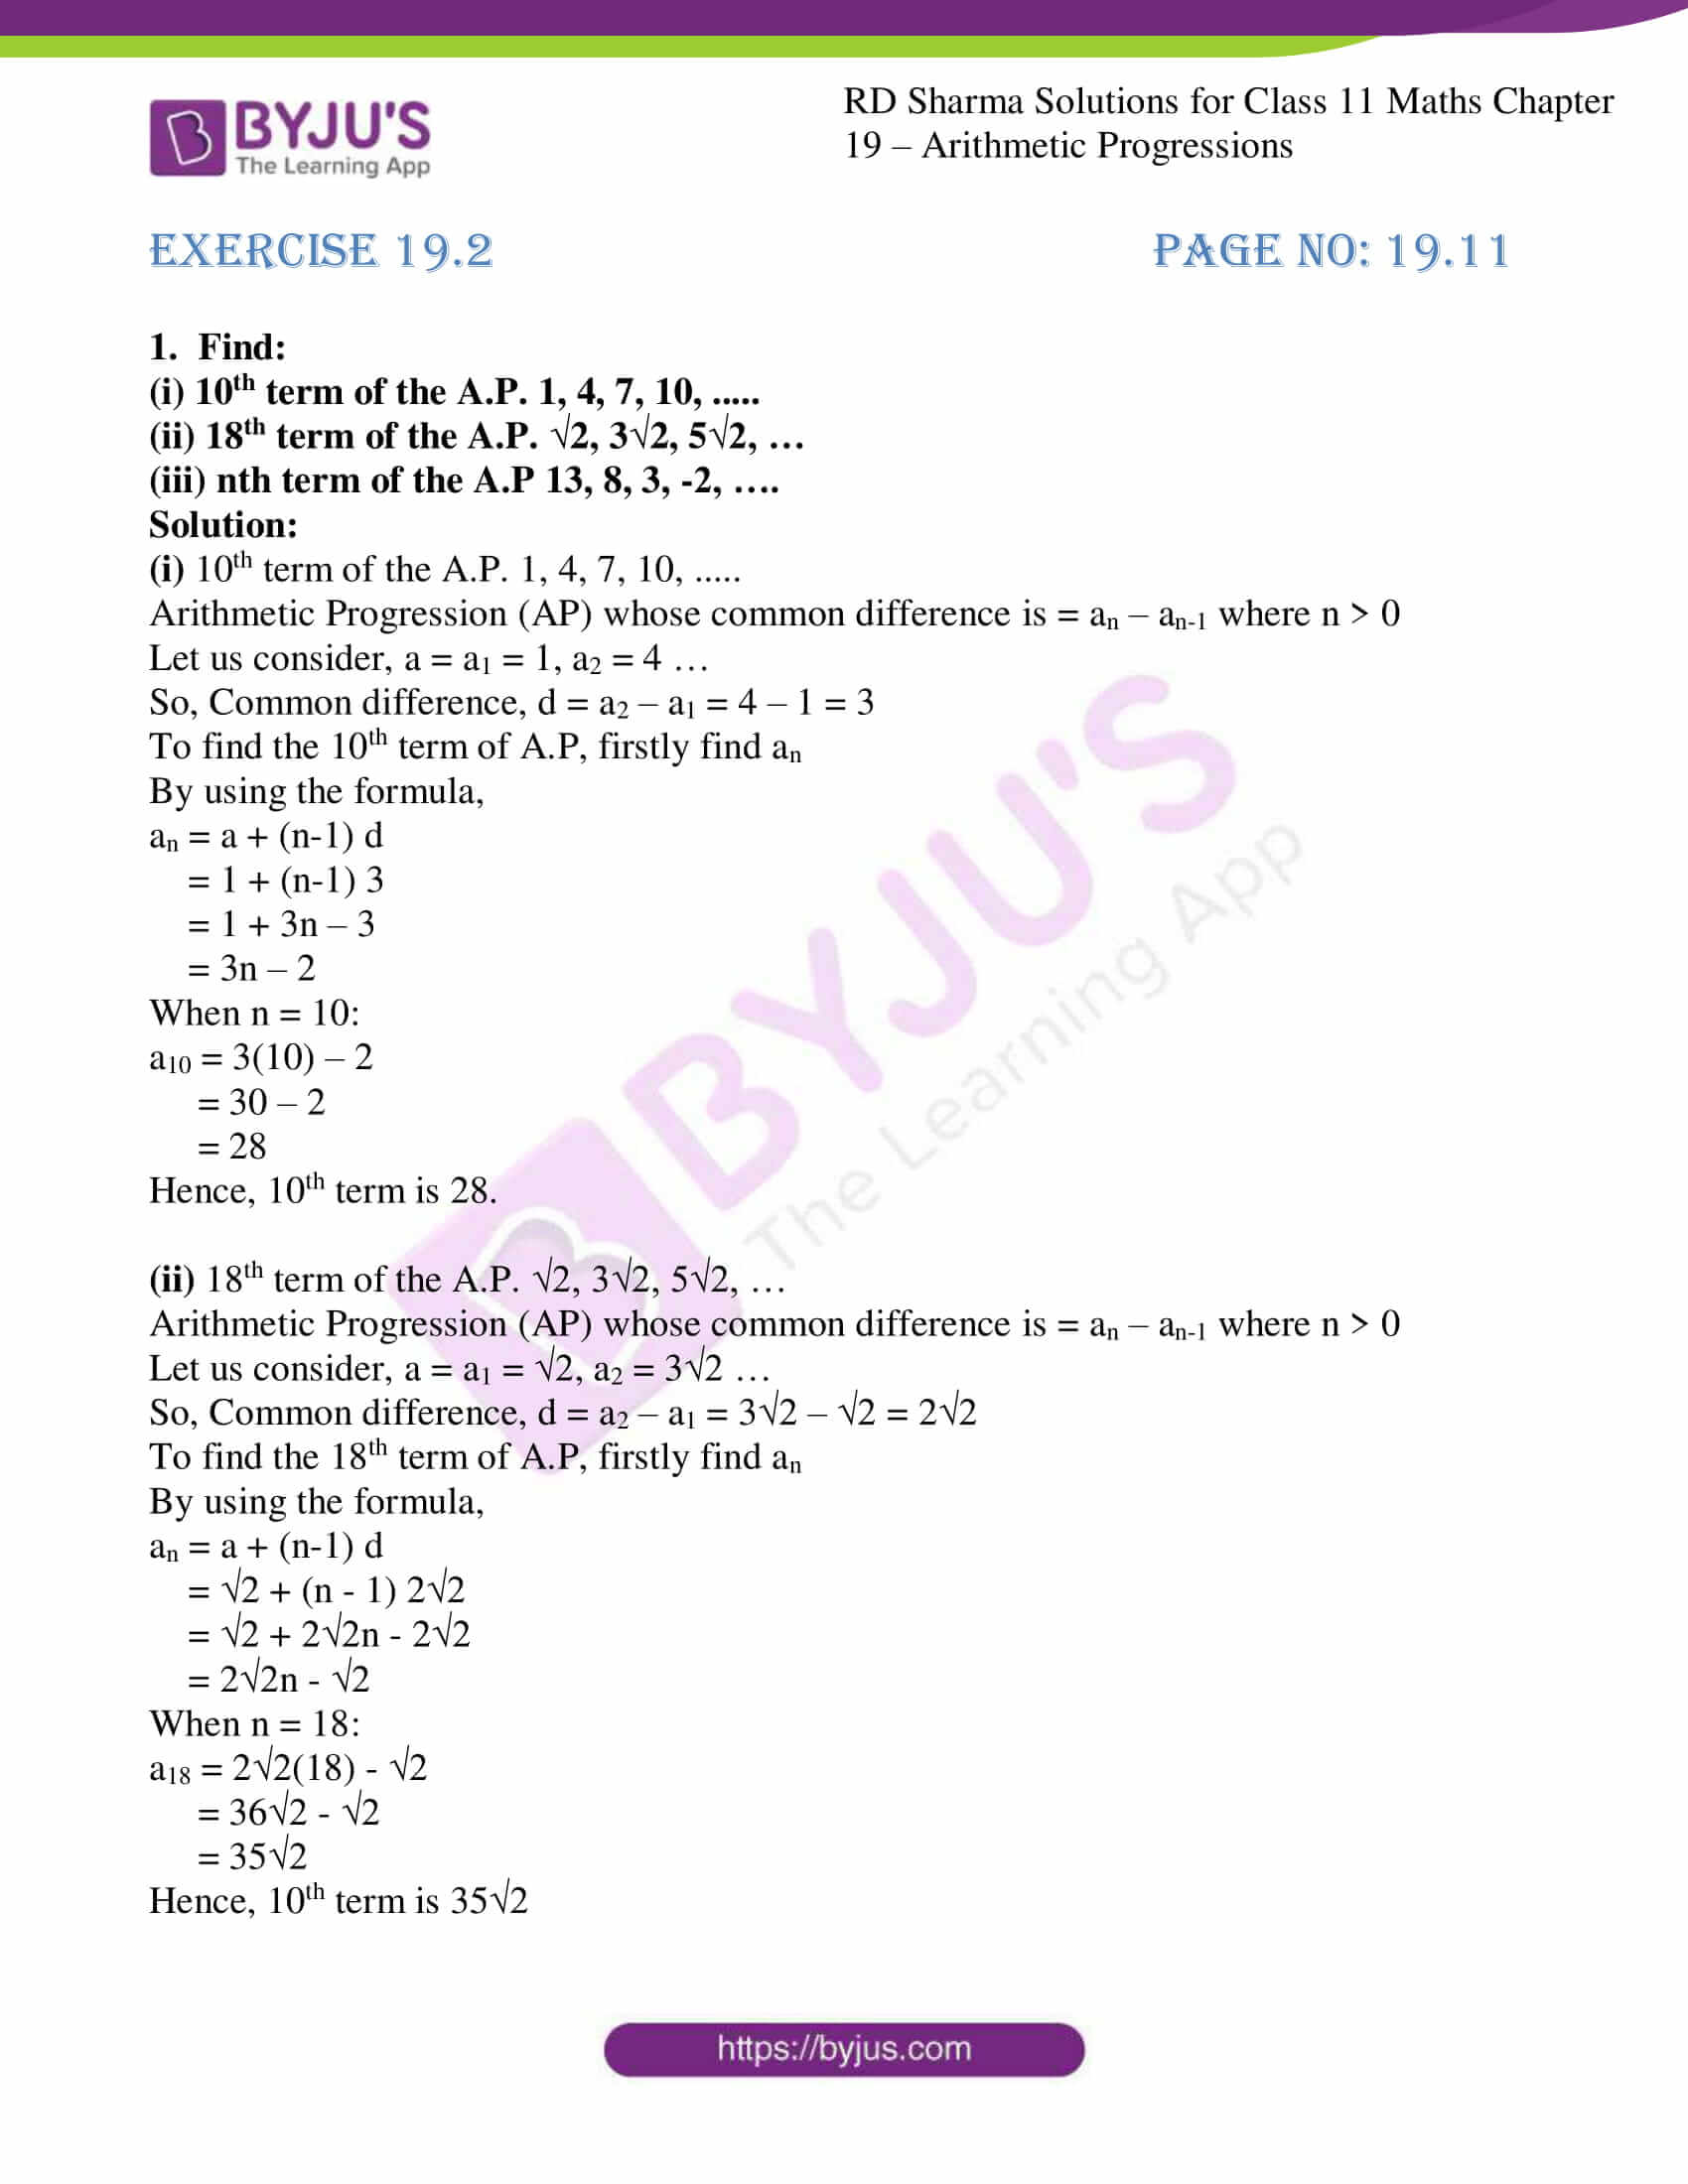 rd sharma class 11 maths ch 19 ex 2 01